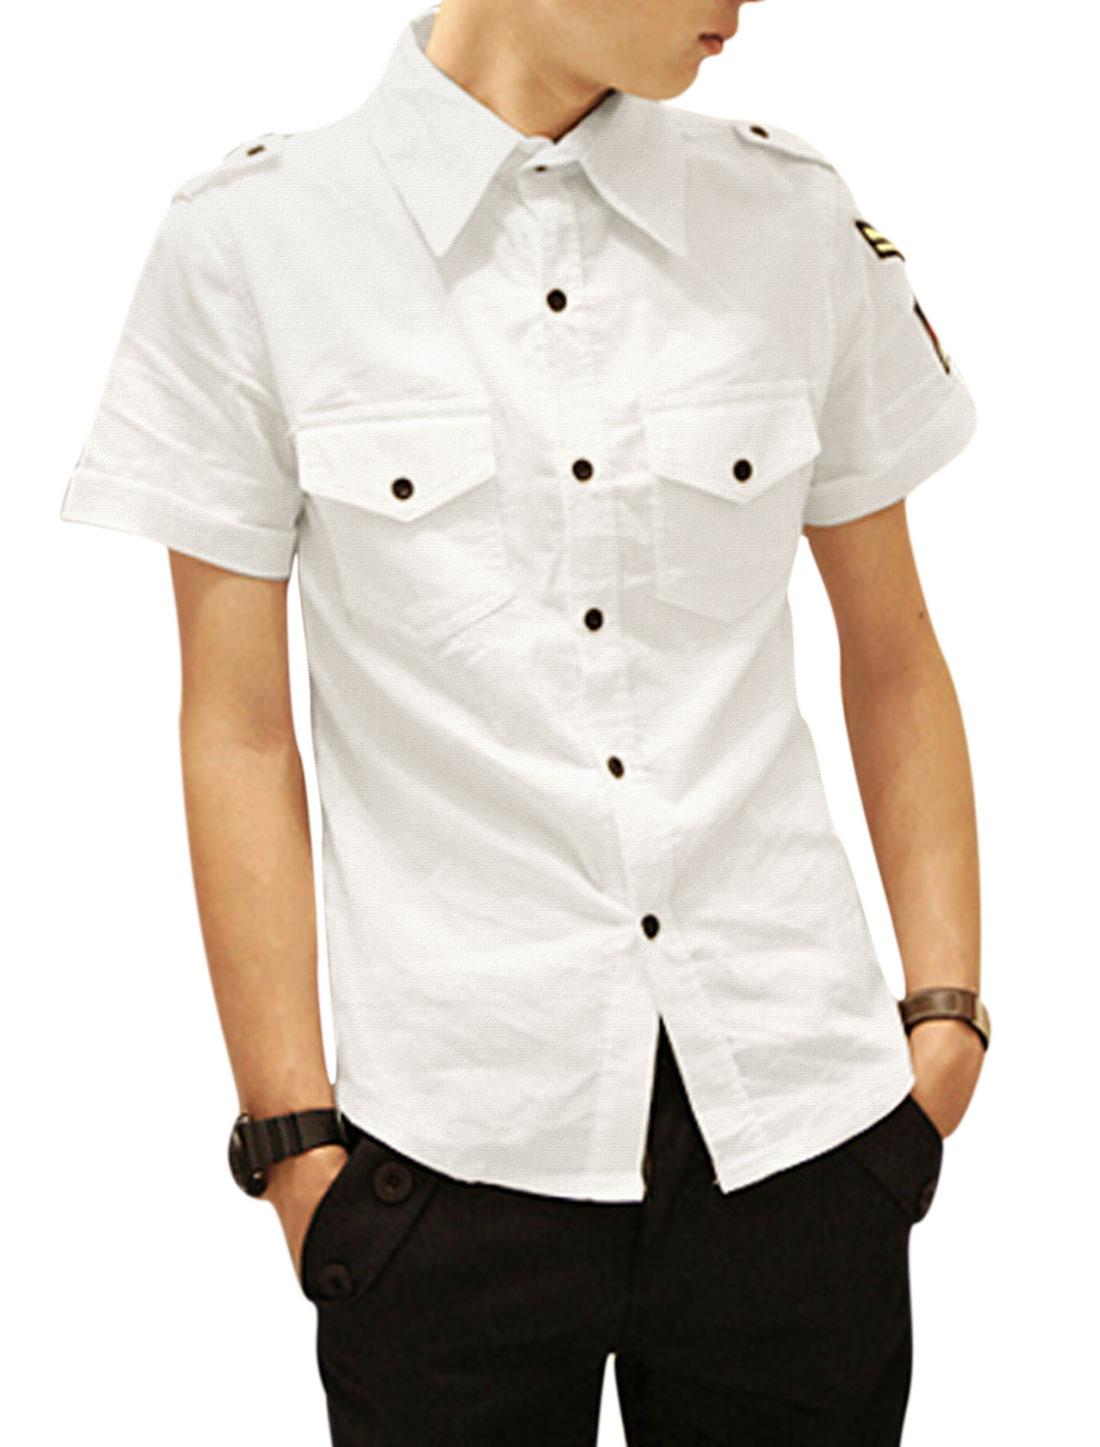 Men Casual Short Sleeve Button-Front Epaulette Decor Shirt White M